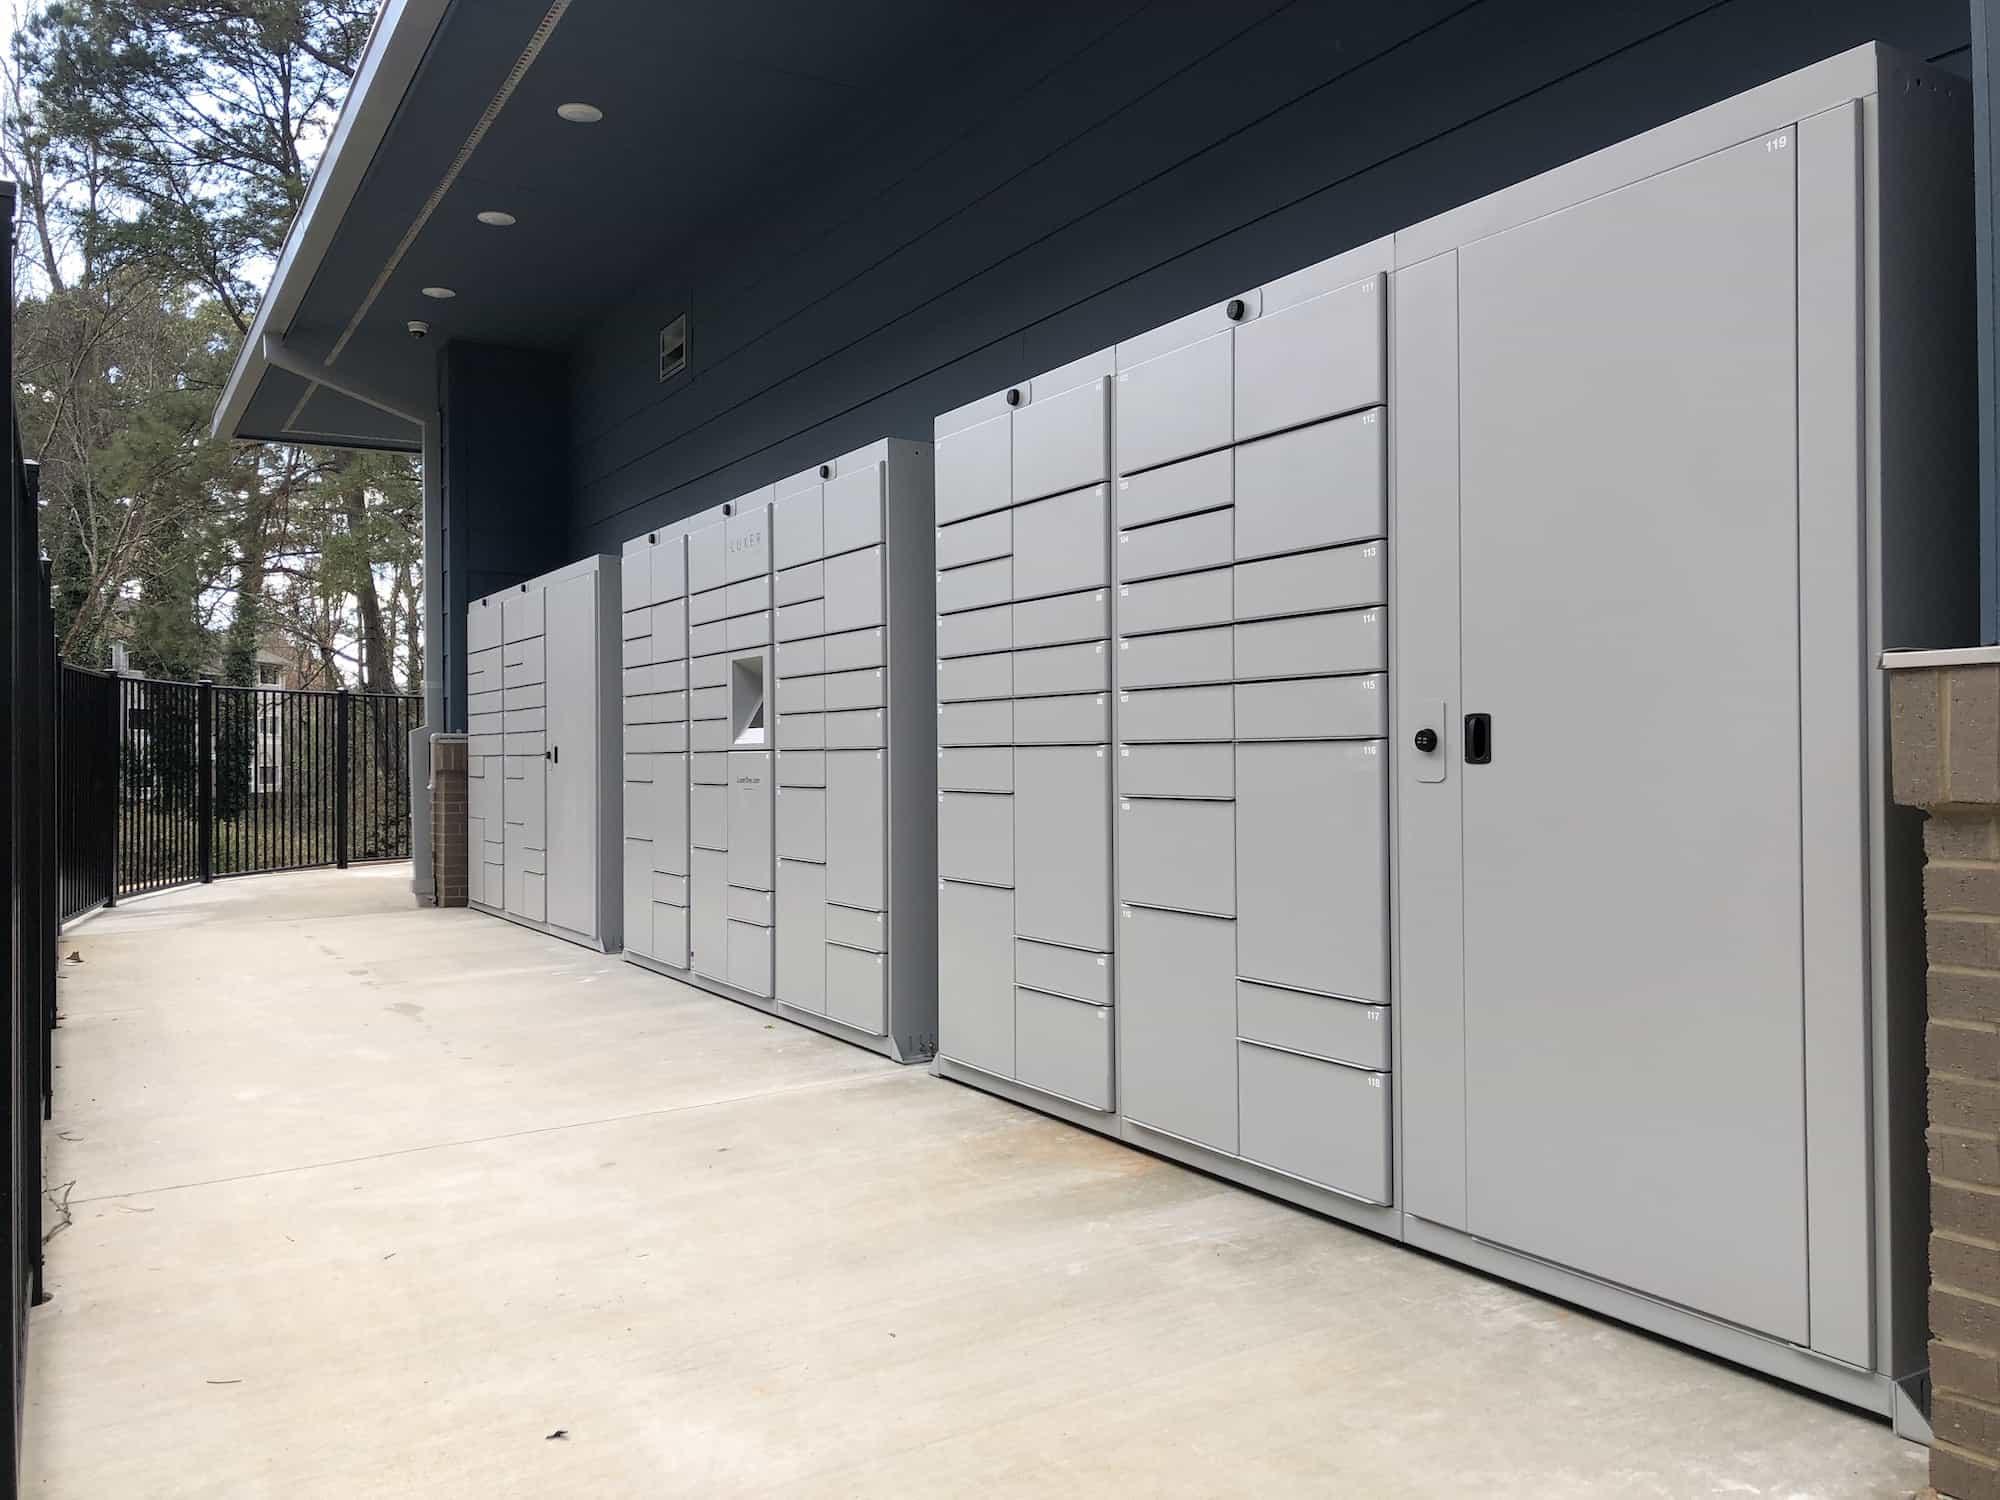 Outdoor Luxer One Parcel Lockers